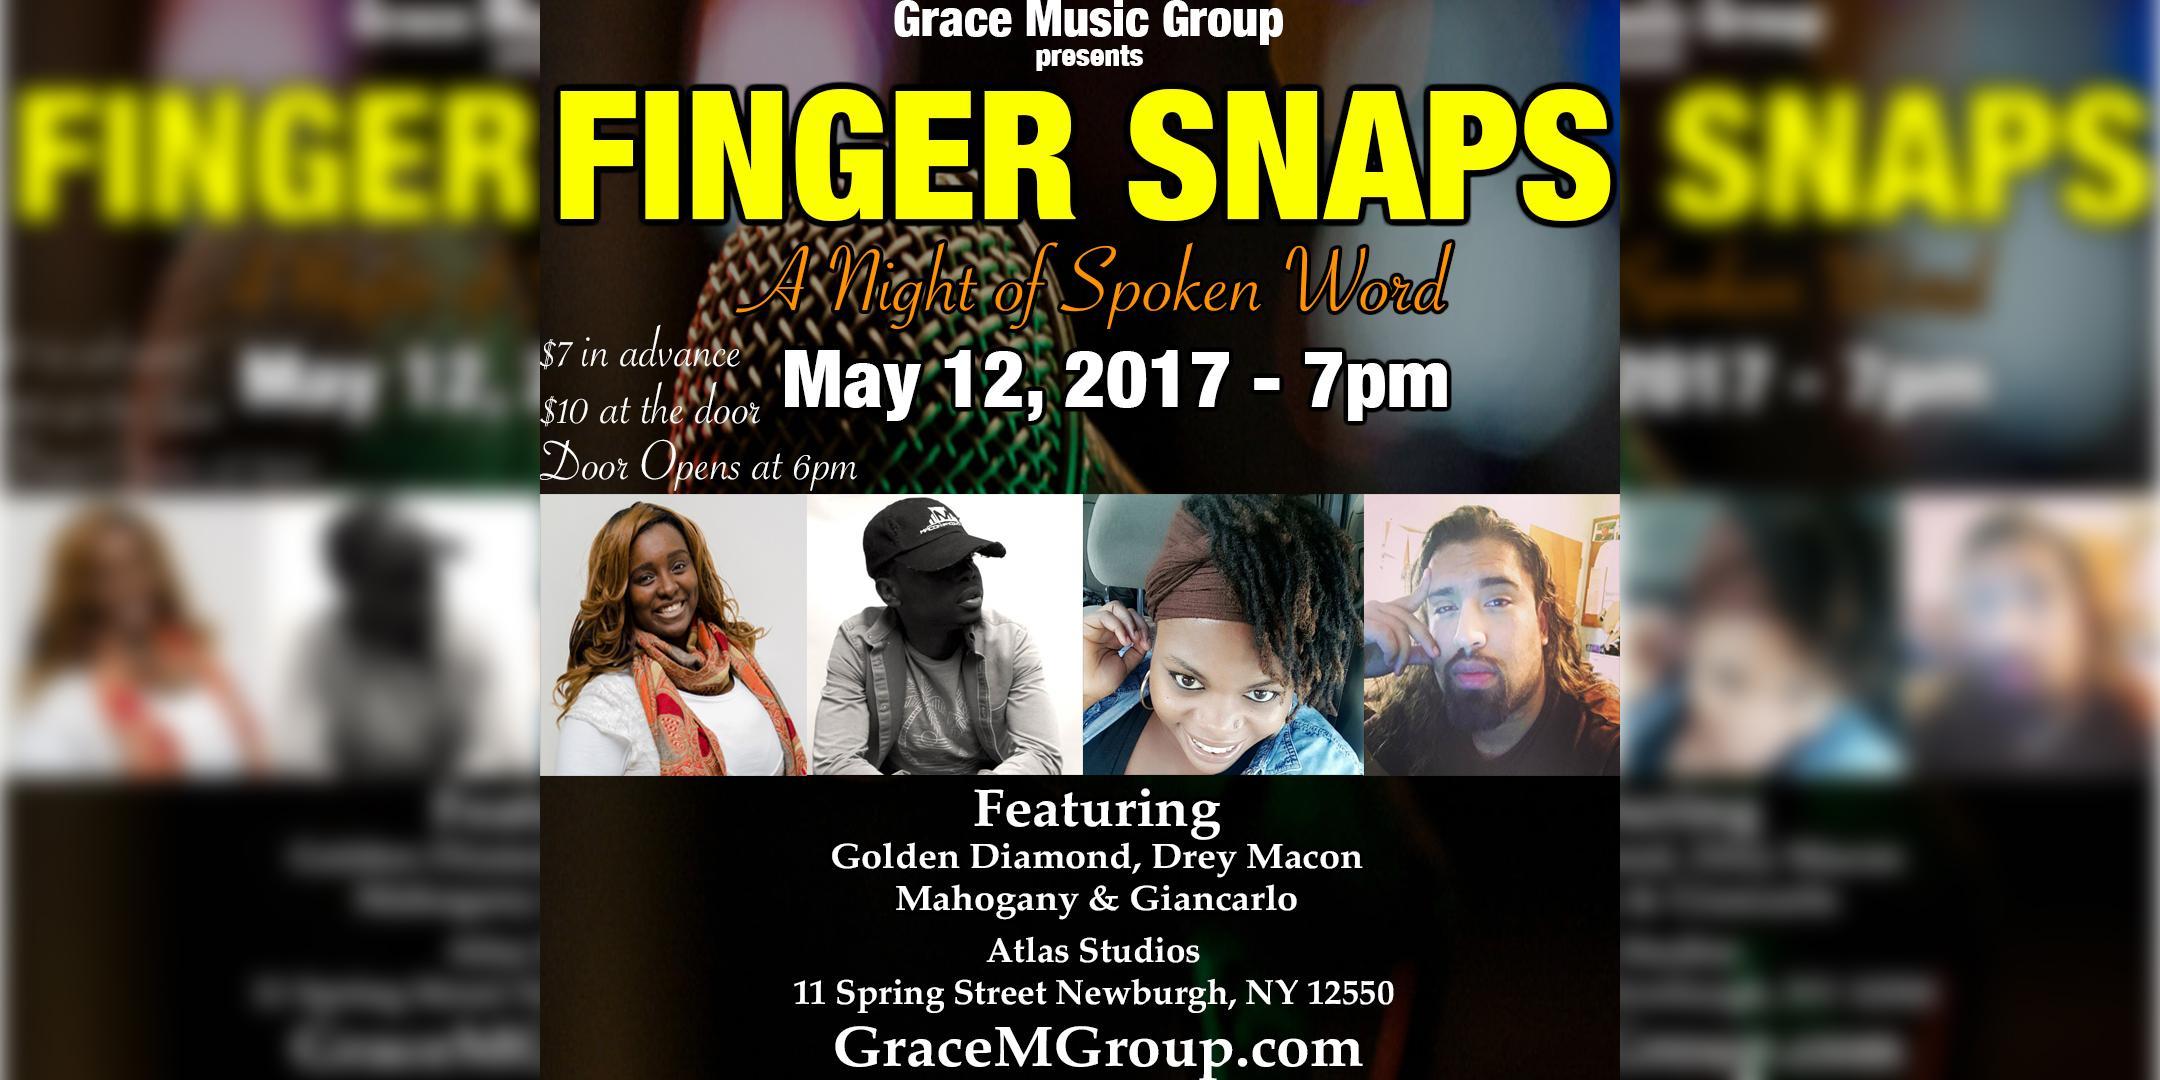 Fingers Snaps: A Night of Spoken Word